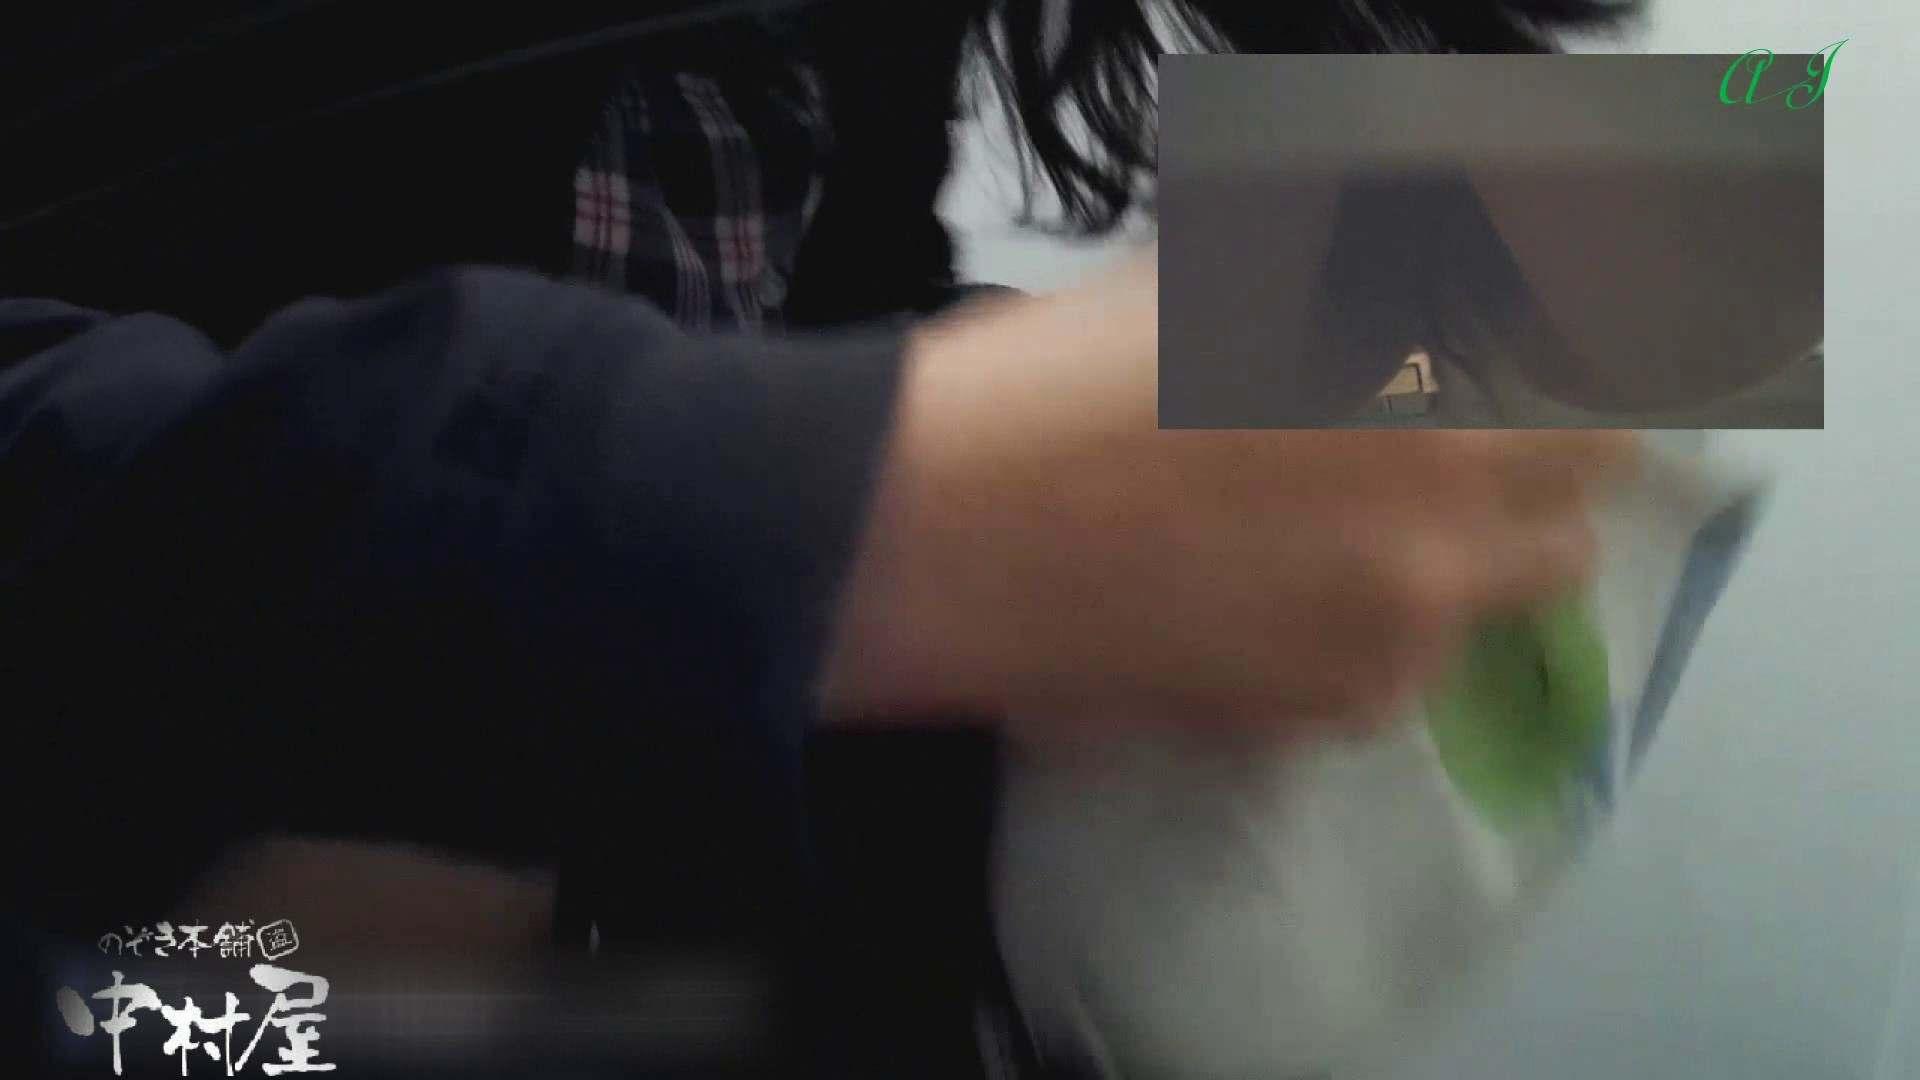 有名大学女性洗面所 vol.79 新アングル丸見え 前編 洗面所 | 丸見え  81連発 81